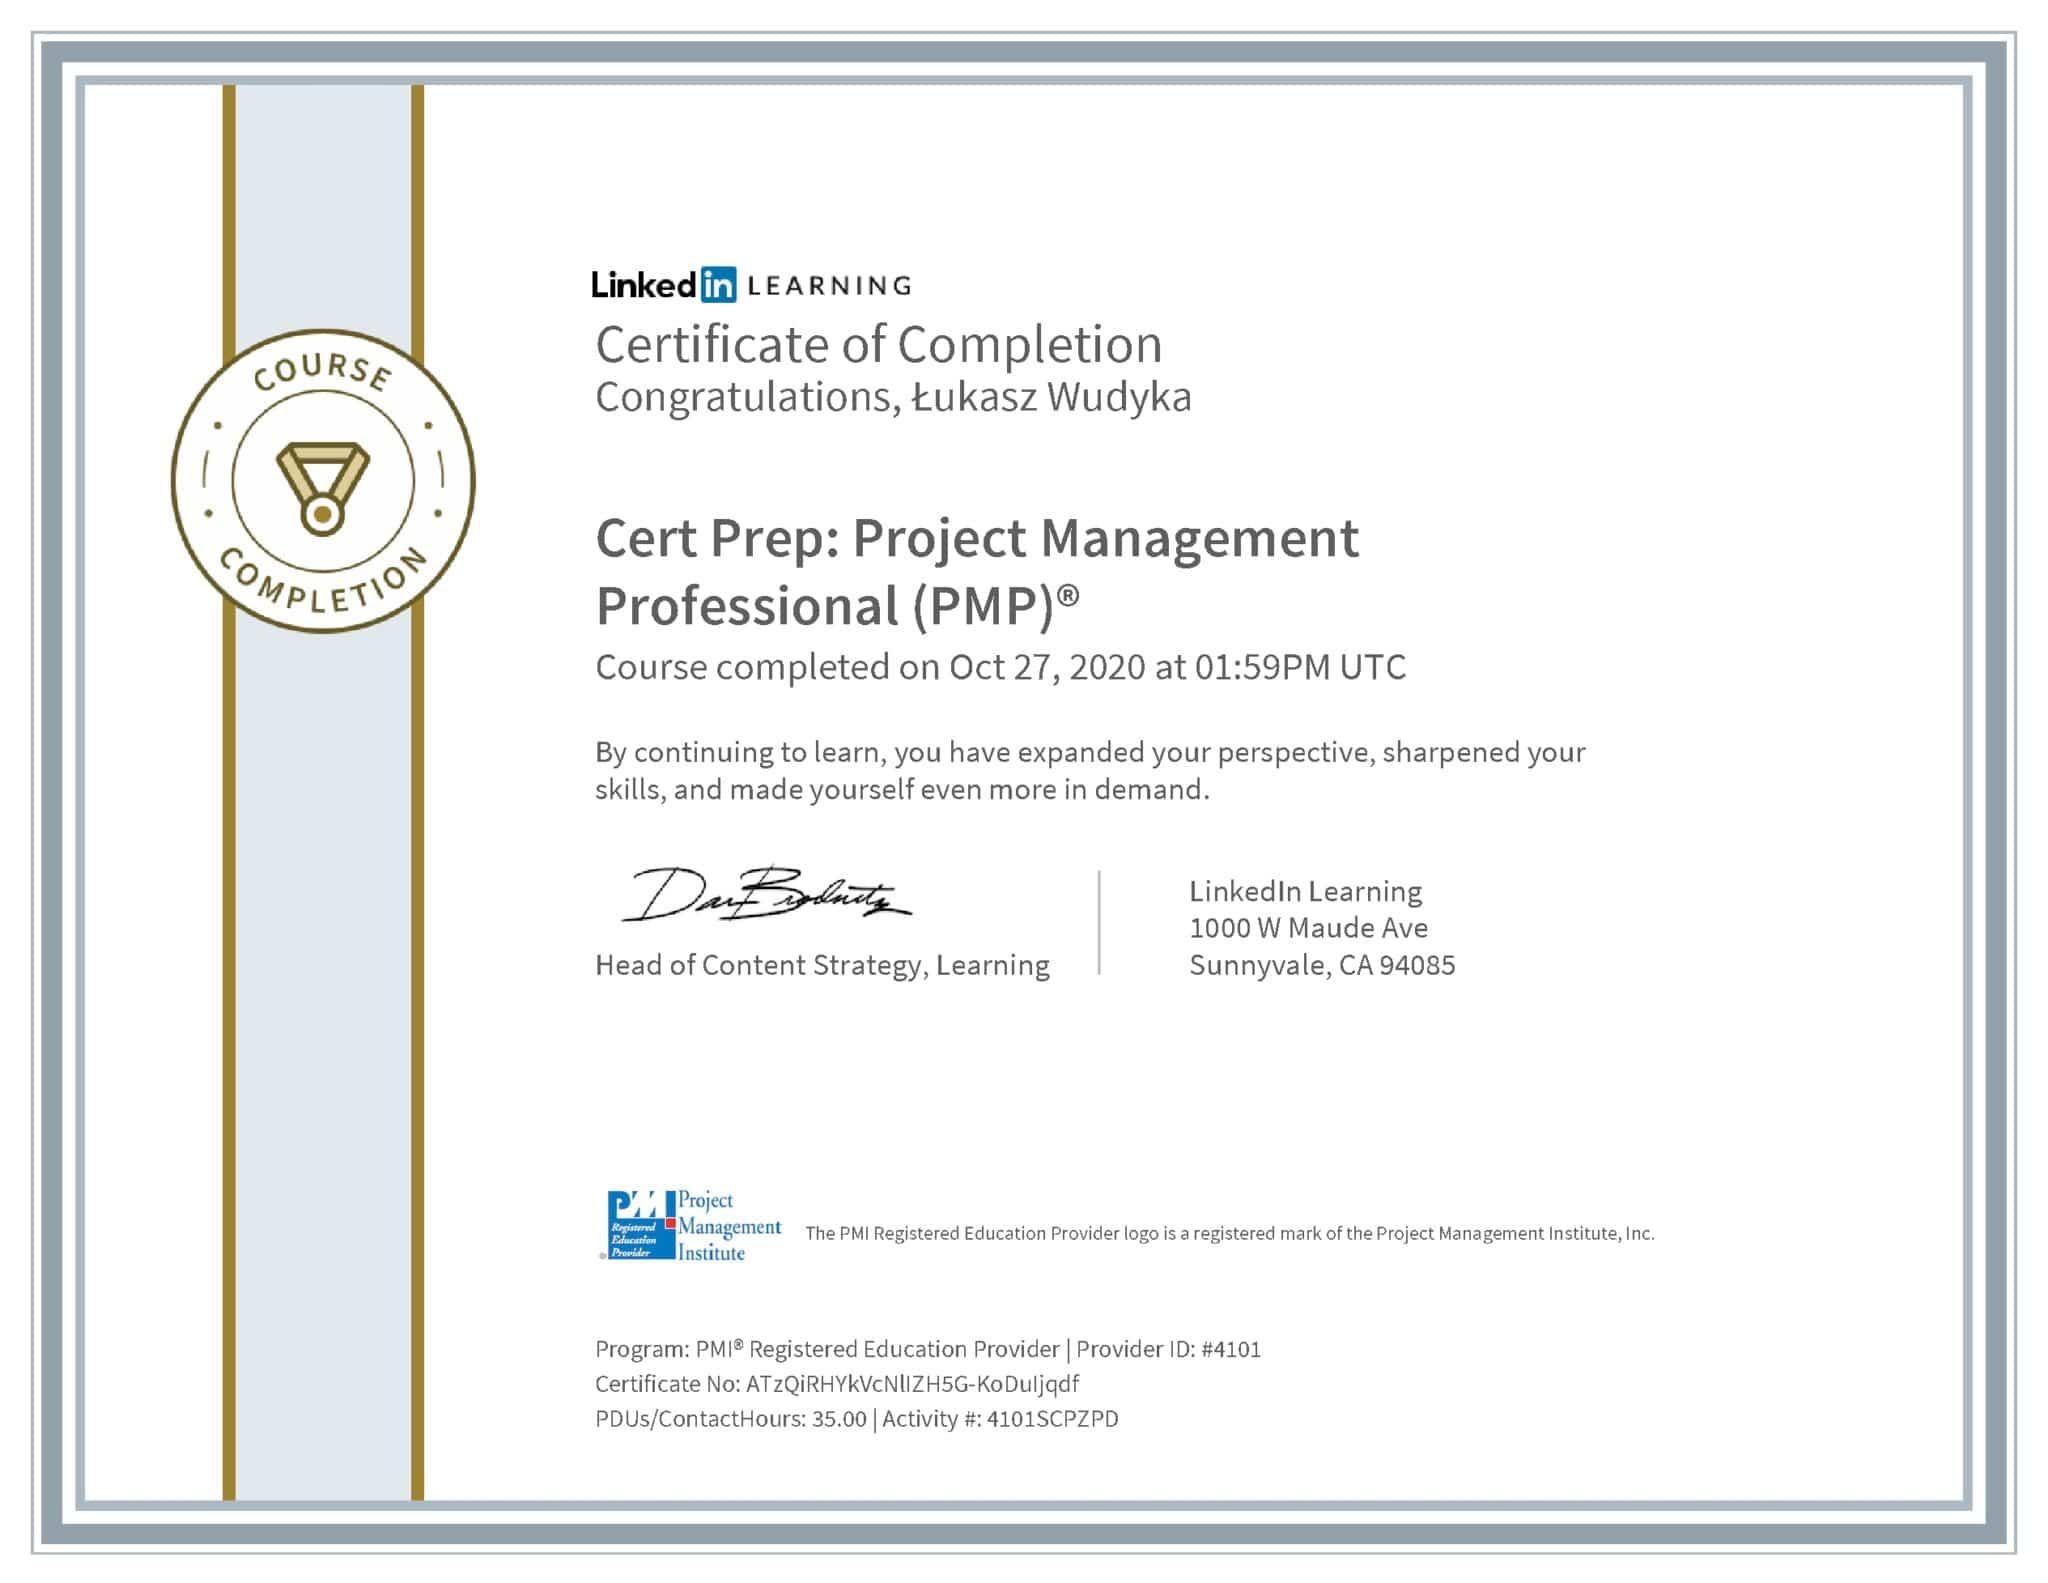 Łukasz Wudyka certyfikat LinkedIn Cert Prep: Project Management Professional (PMP)® PMI